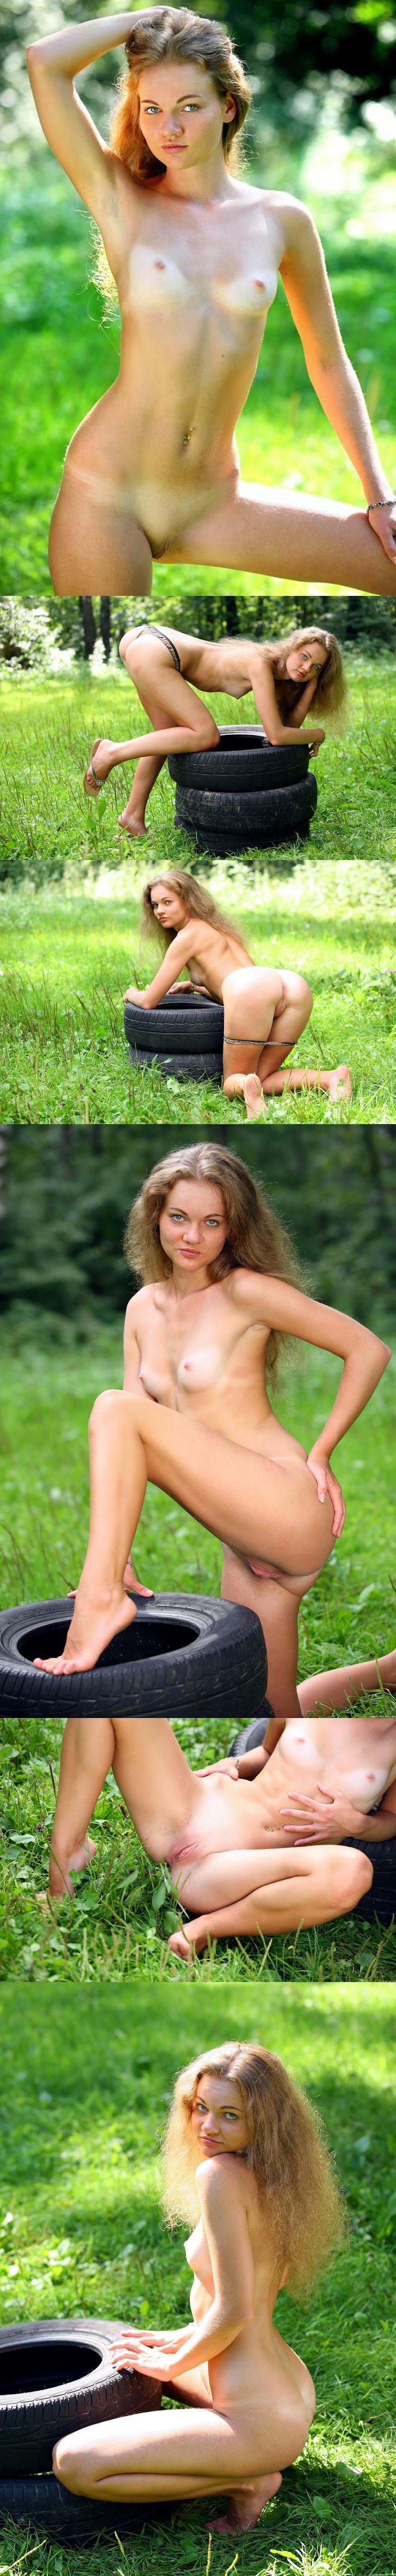 MA_20080826_-_Iveta_C_-_Nokivis_-_by_Max_Asolo.zip-jk- Met-Art MA 20080827 - Jolly A - Presenting - by Volkov